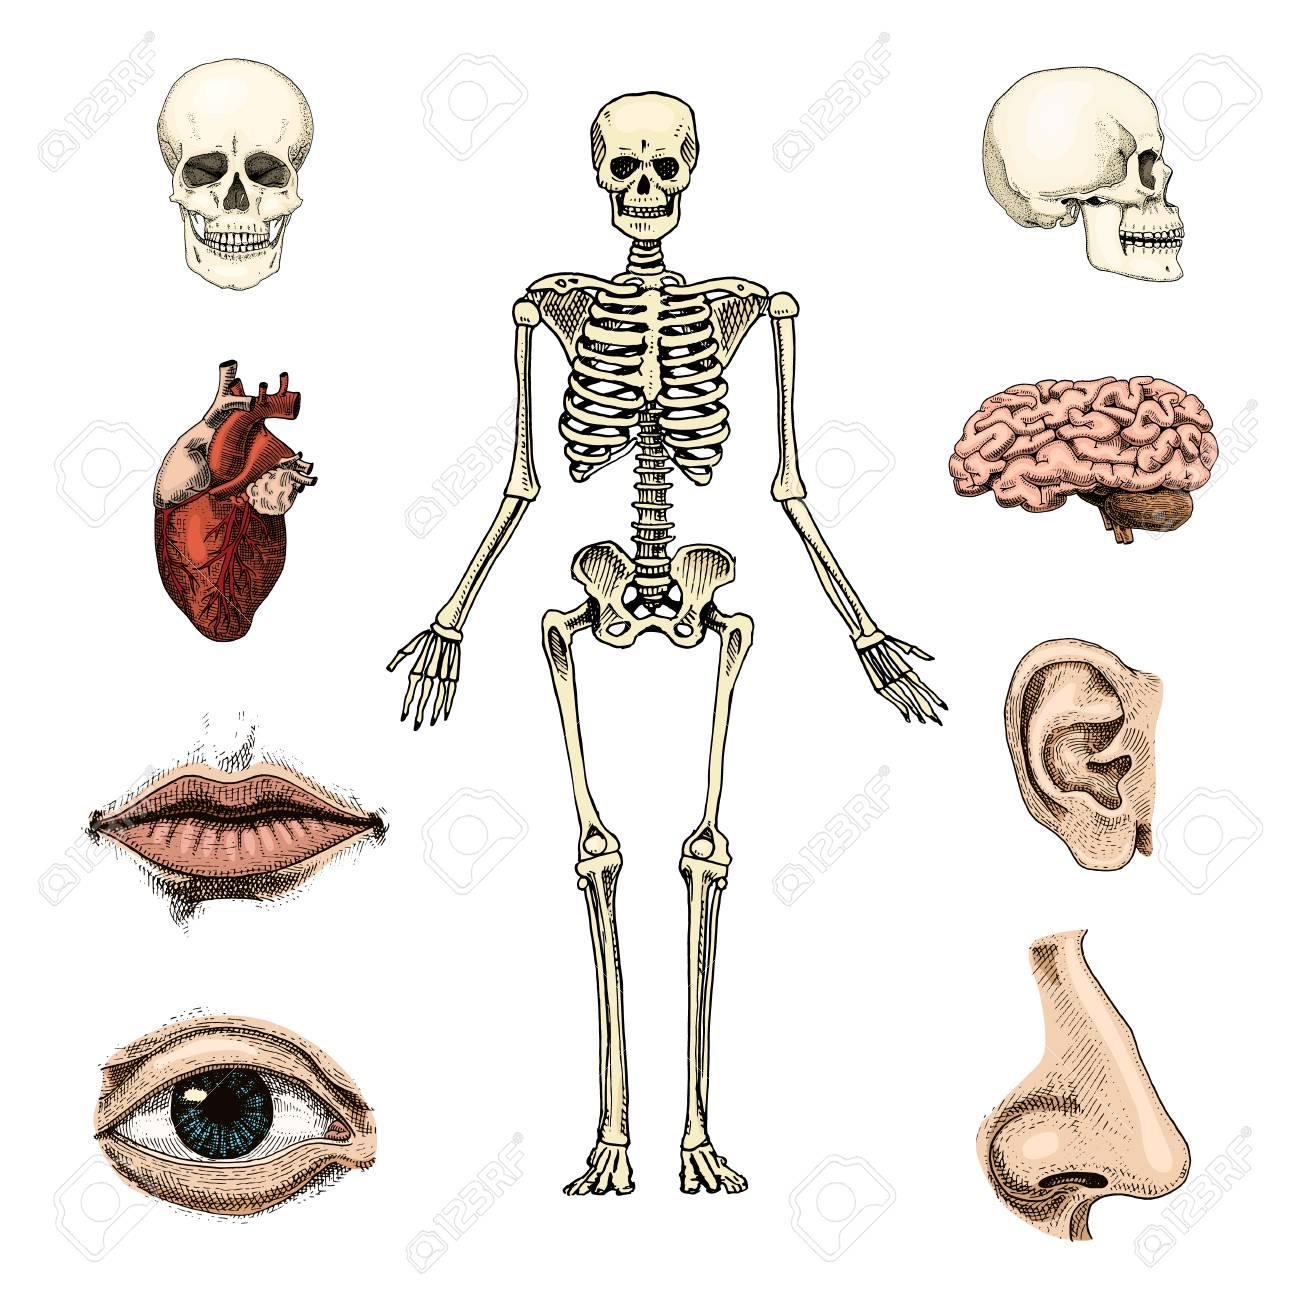 Human Biology, Anatomy Illustration. Skull, Skeleton, Lips, Ear ...